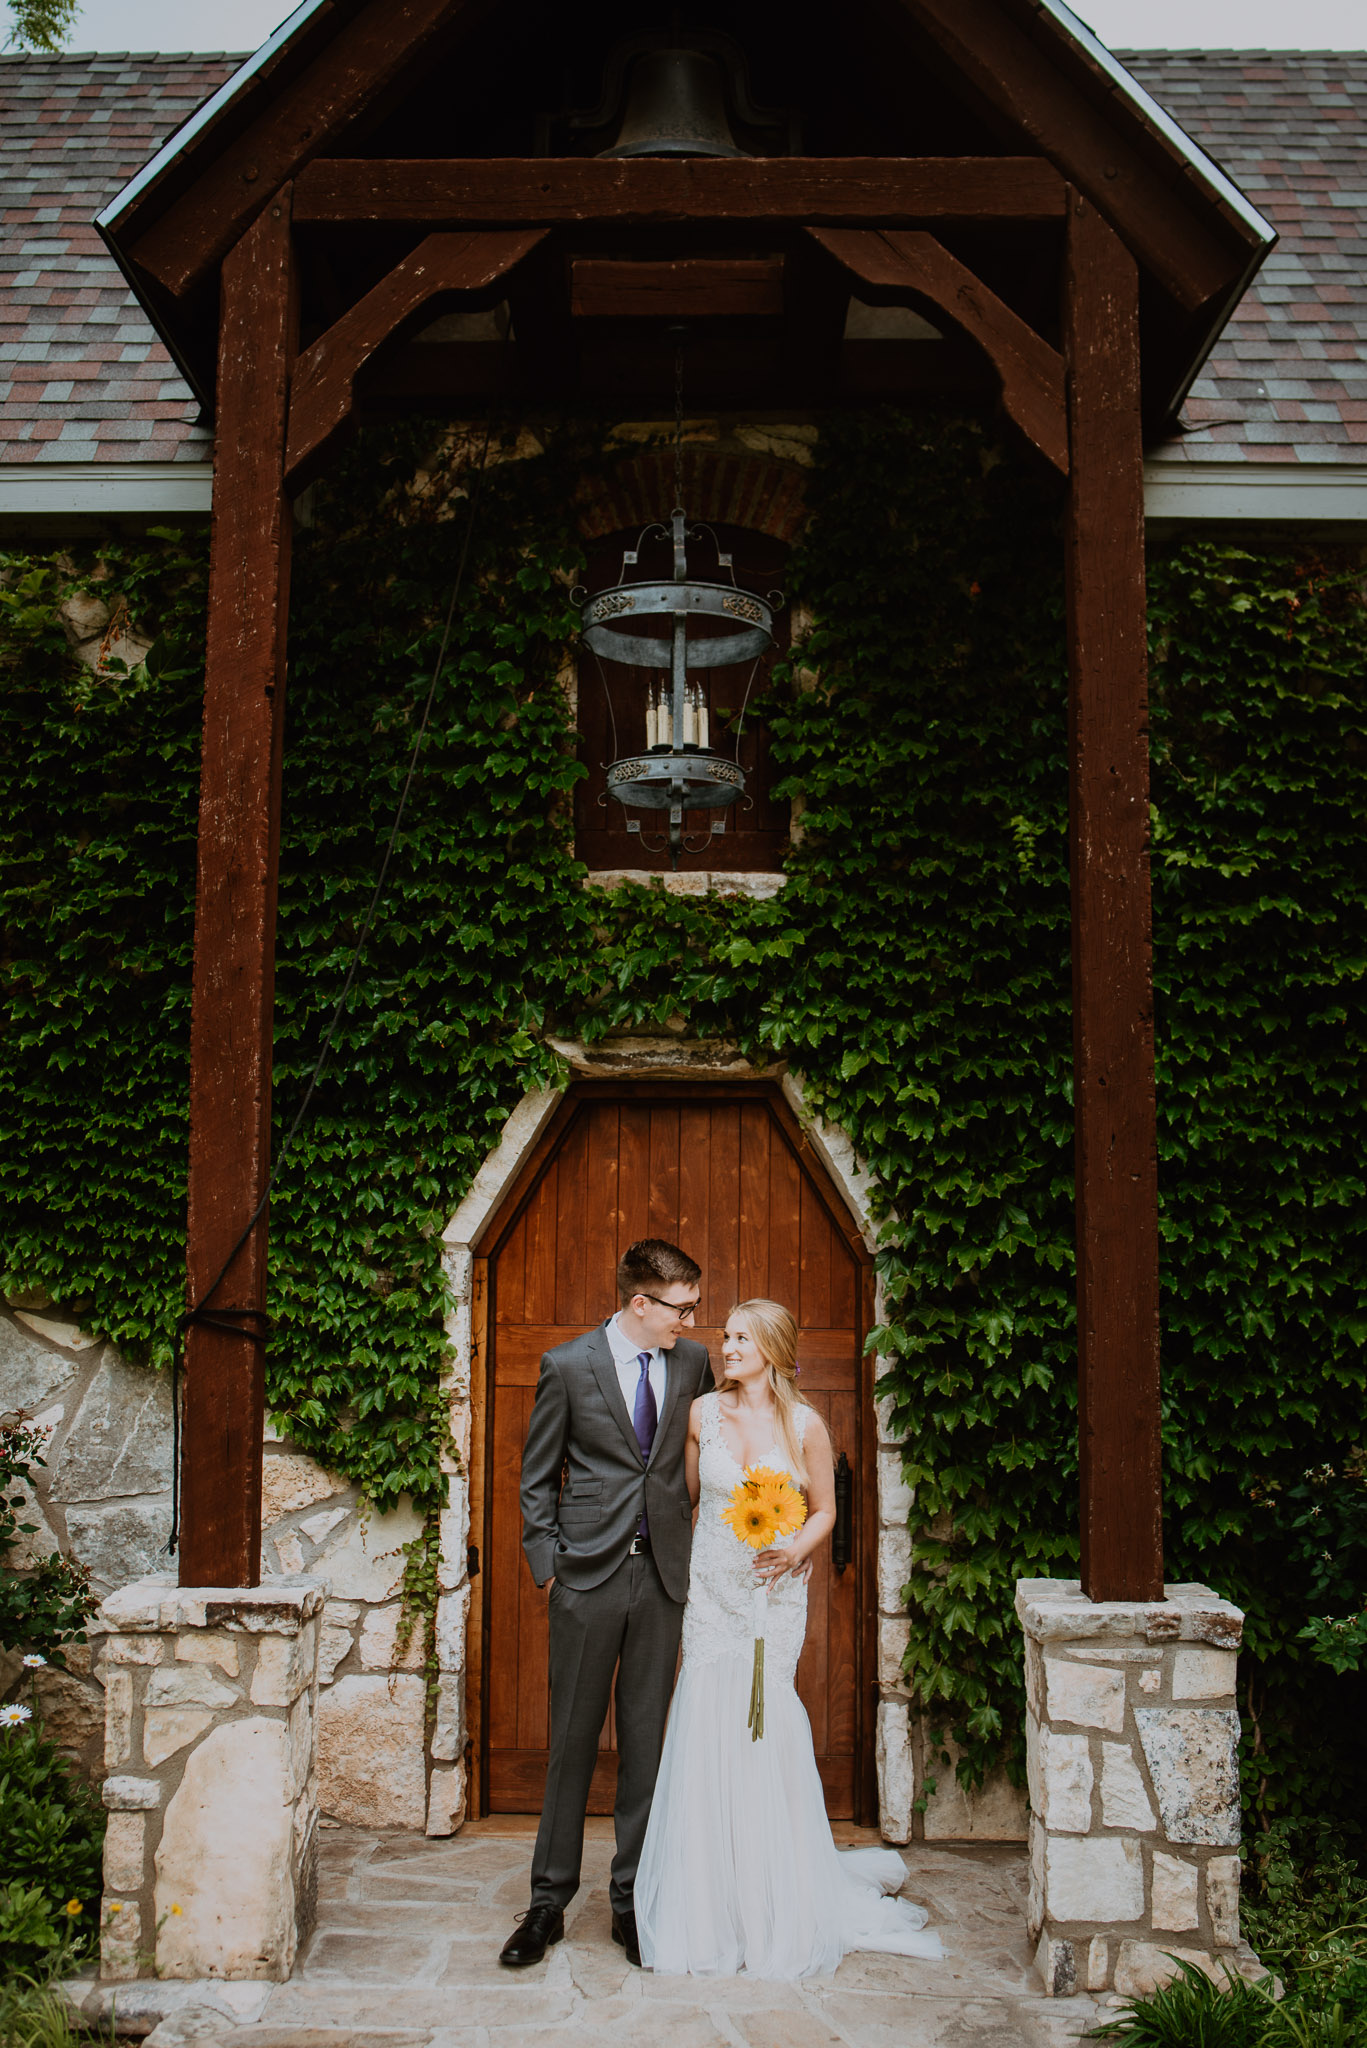 Christoval-vineyard-wedding-heather-justin-0010.jpg